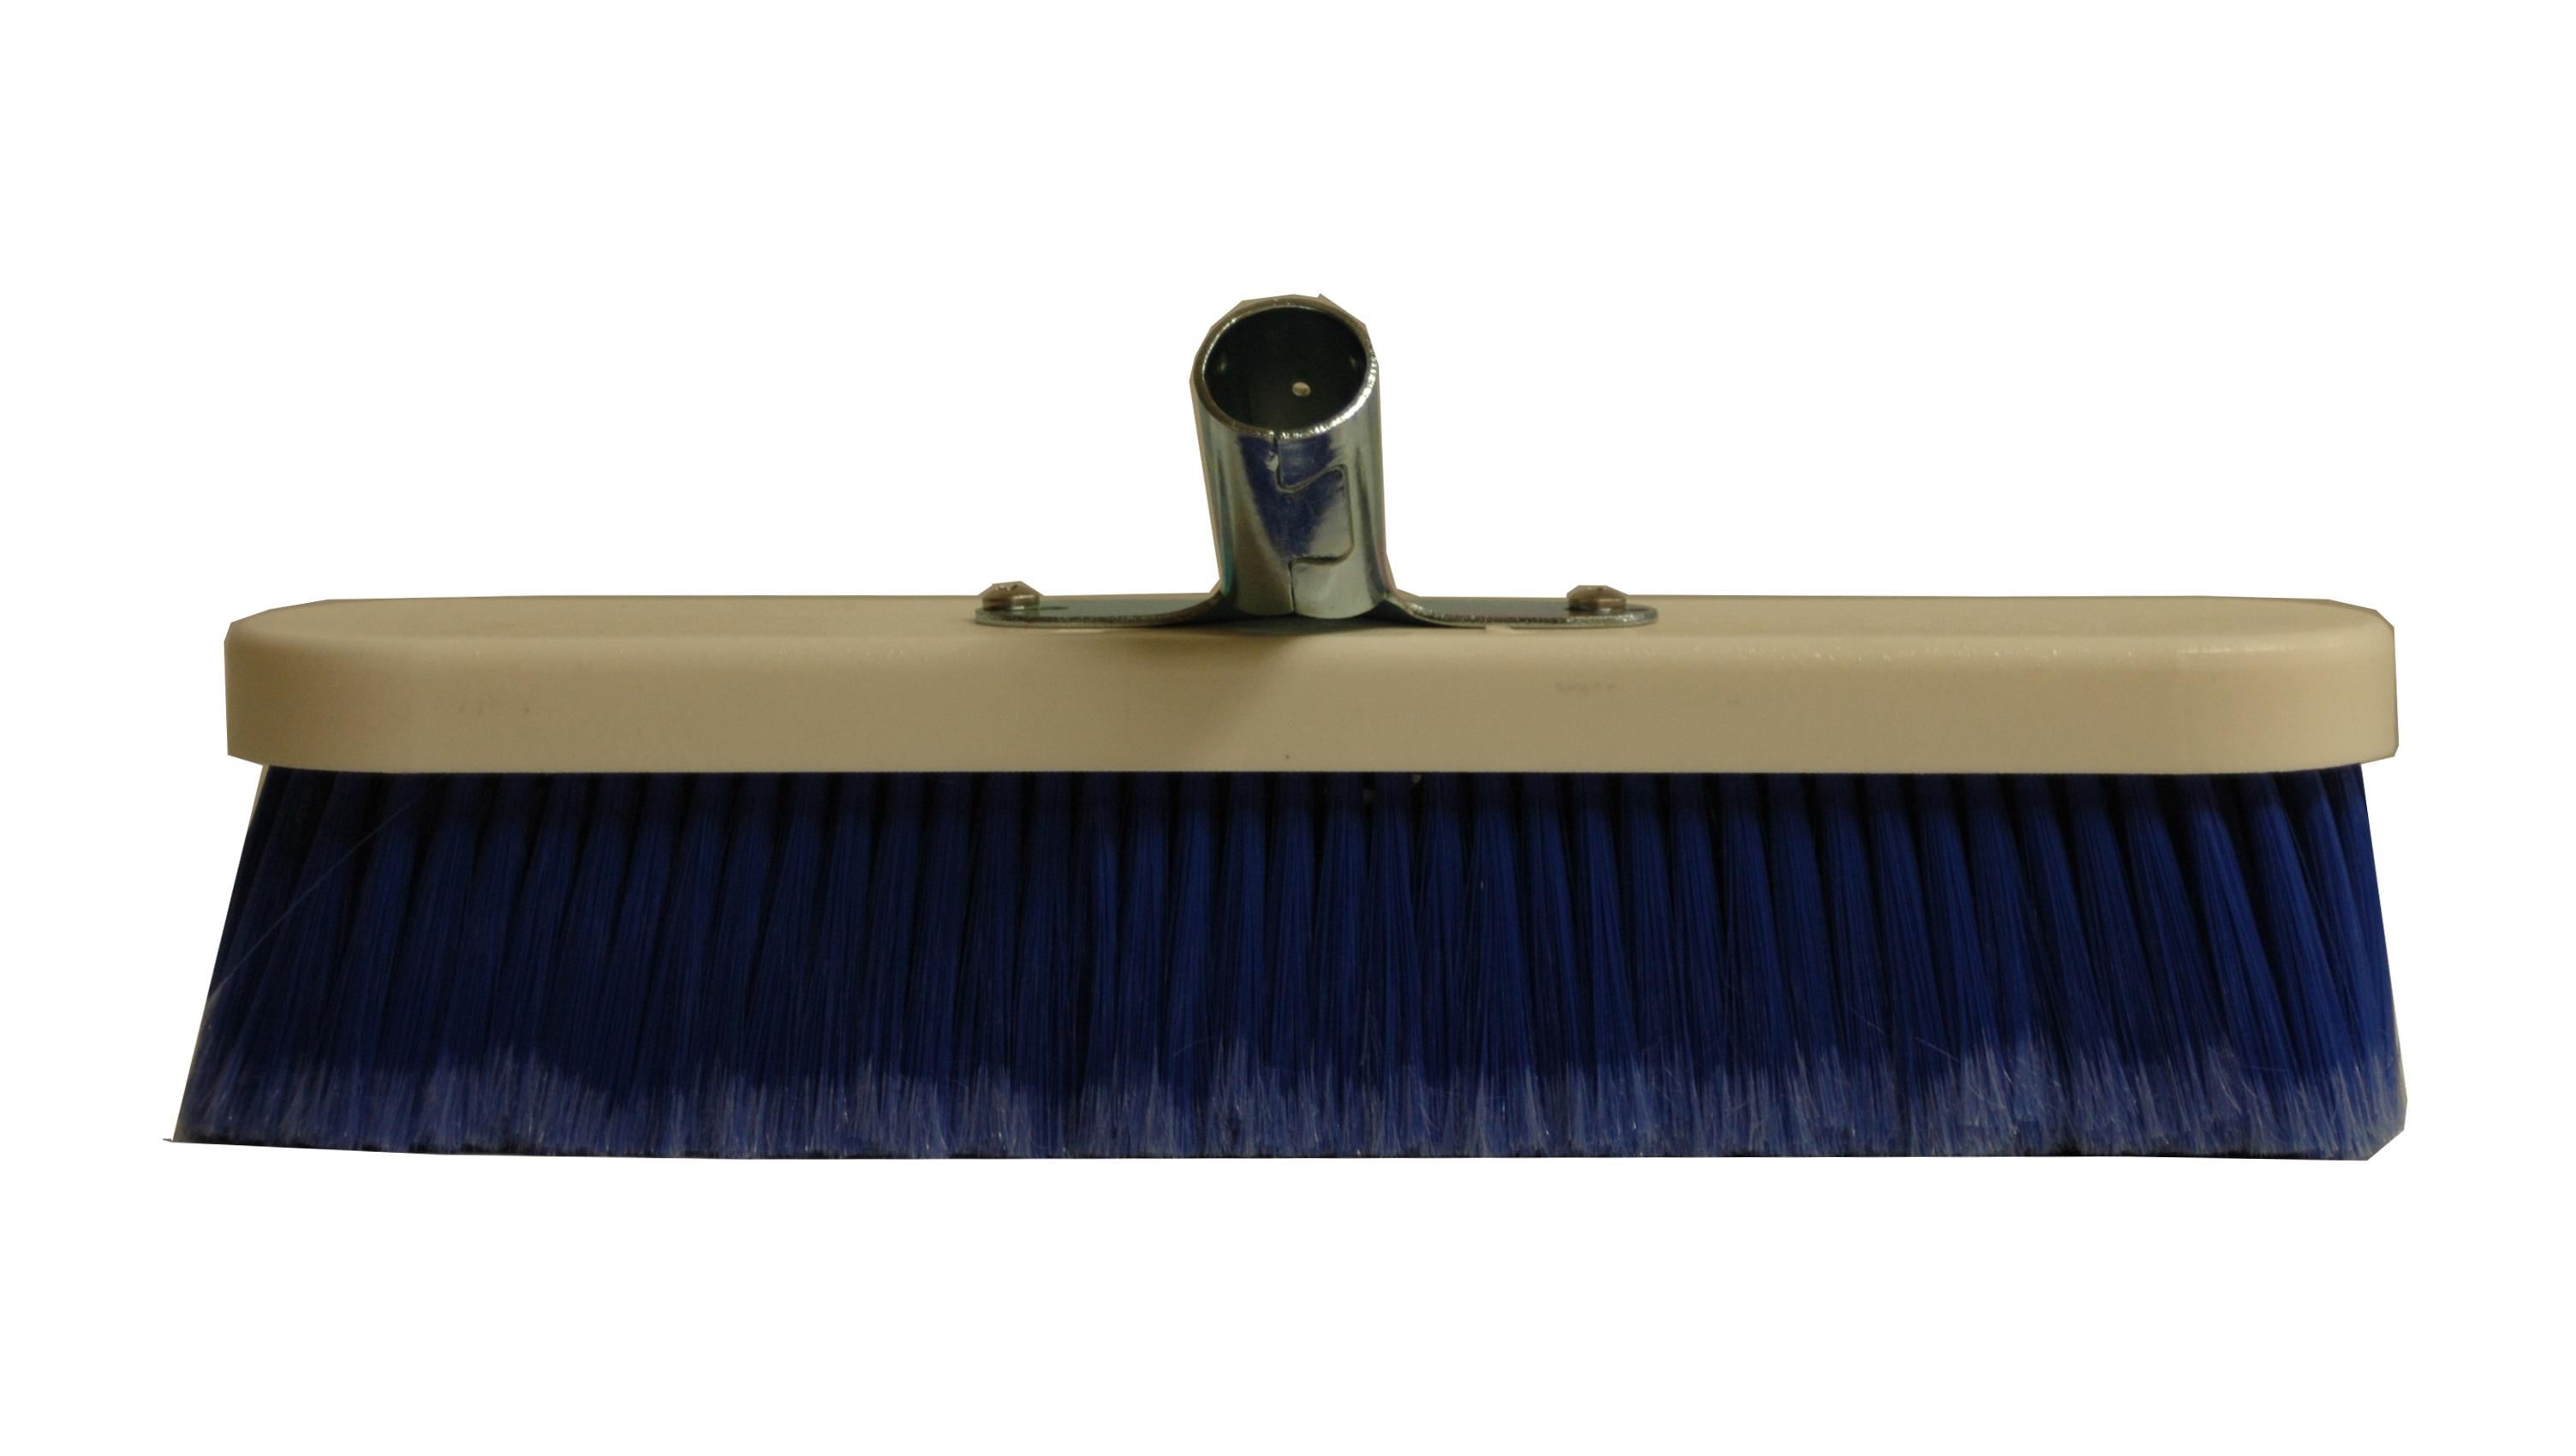 Kartáč na mytí vozidel - RILSAN 35 cm